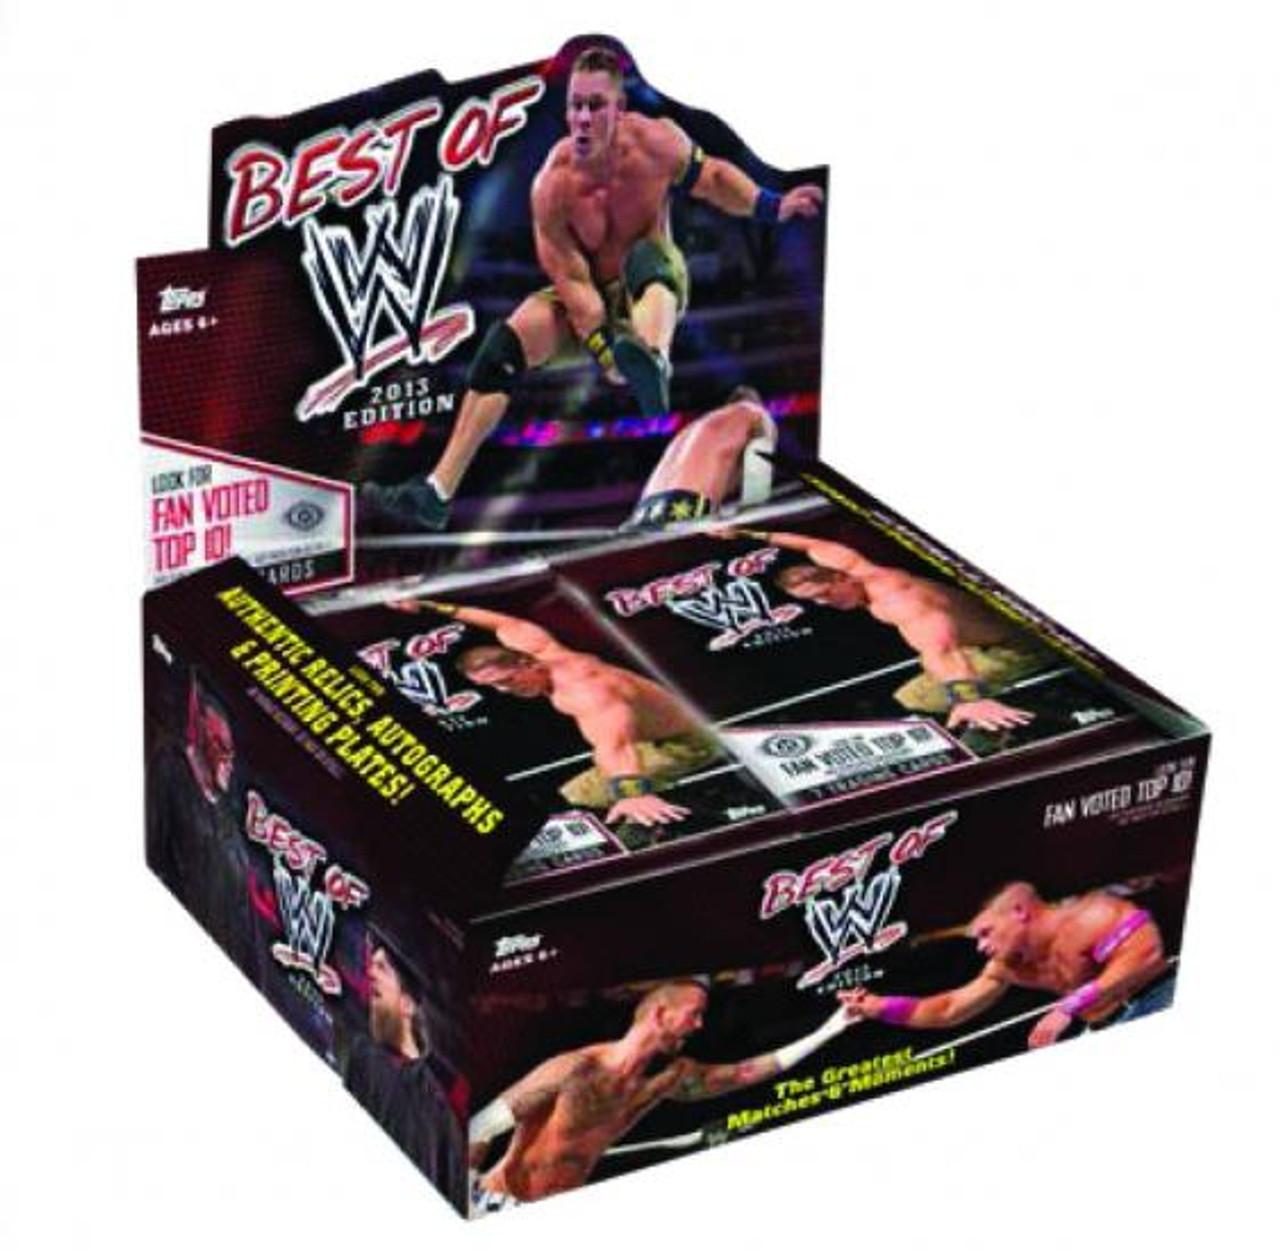 WWE Wrestling 2013 Best of WWE Trading Card Box